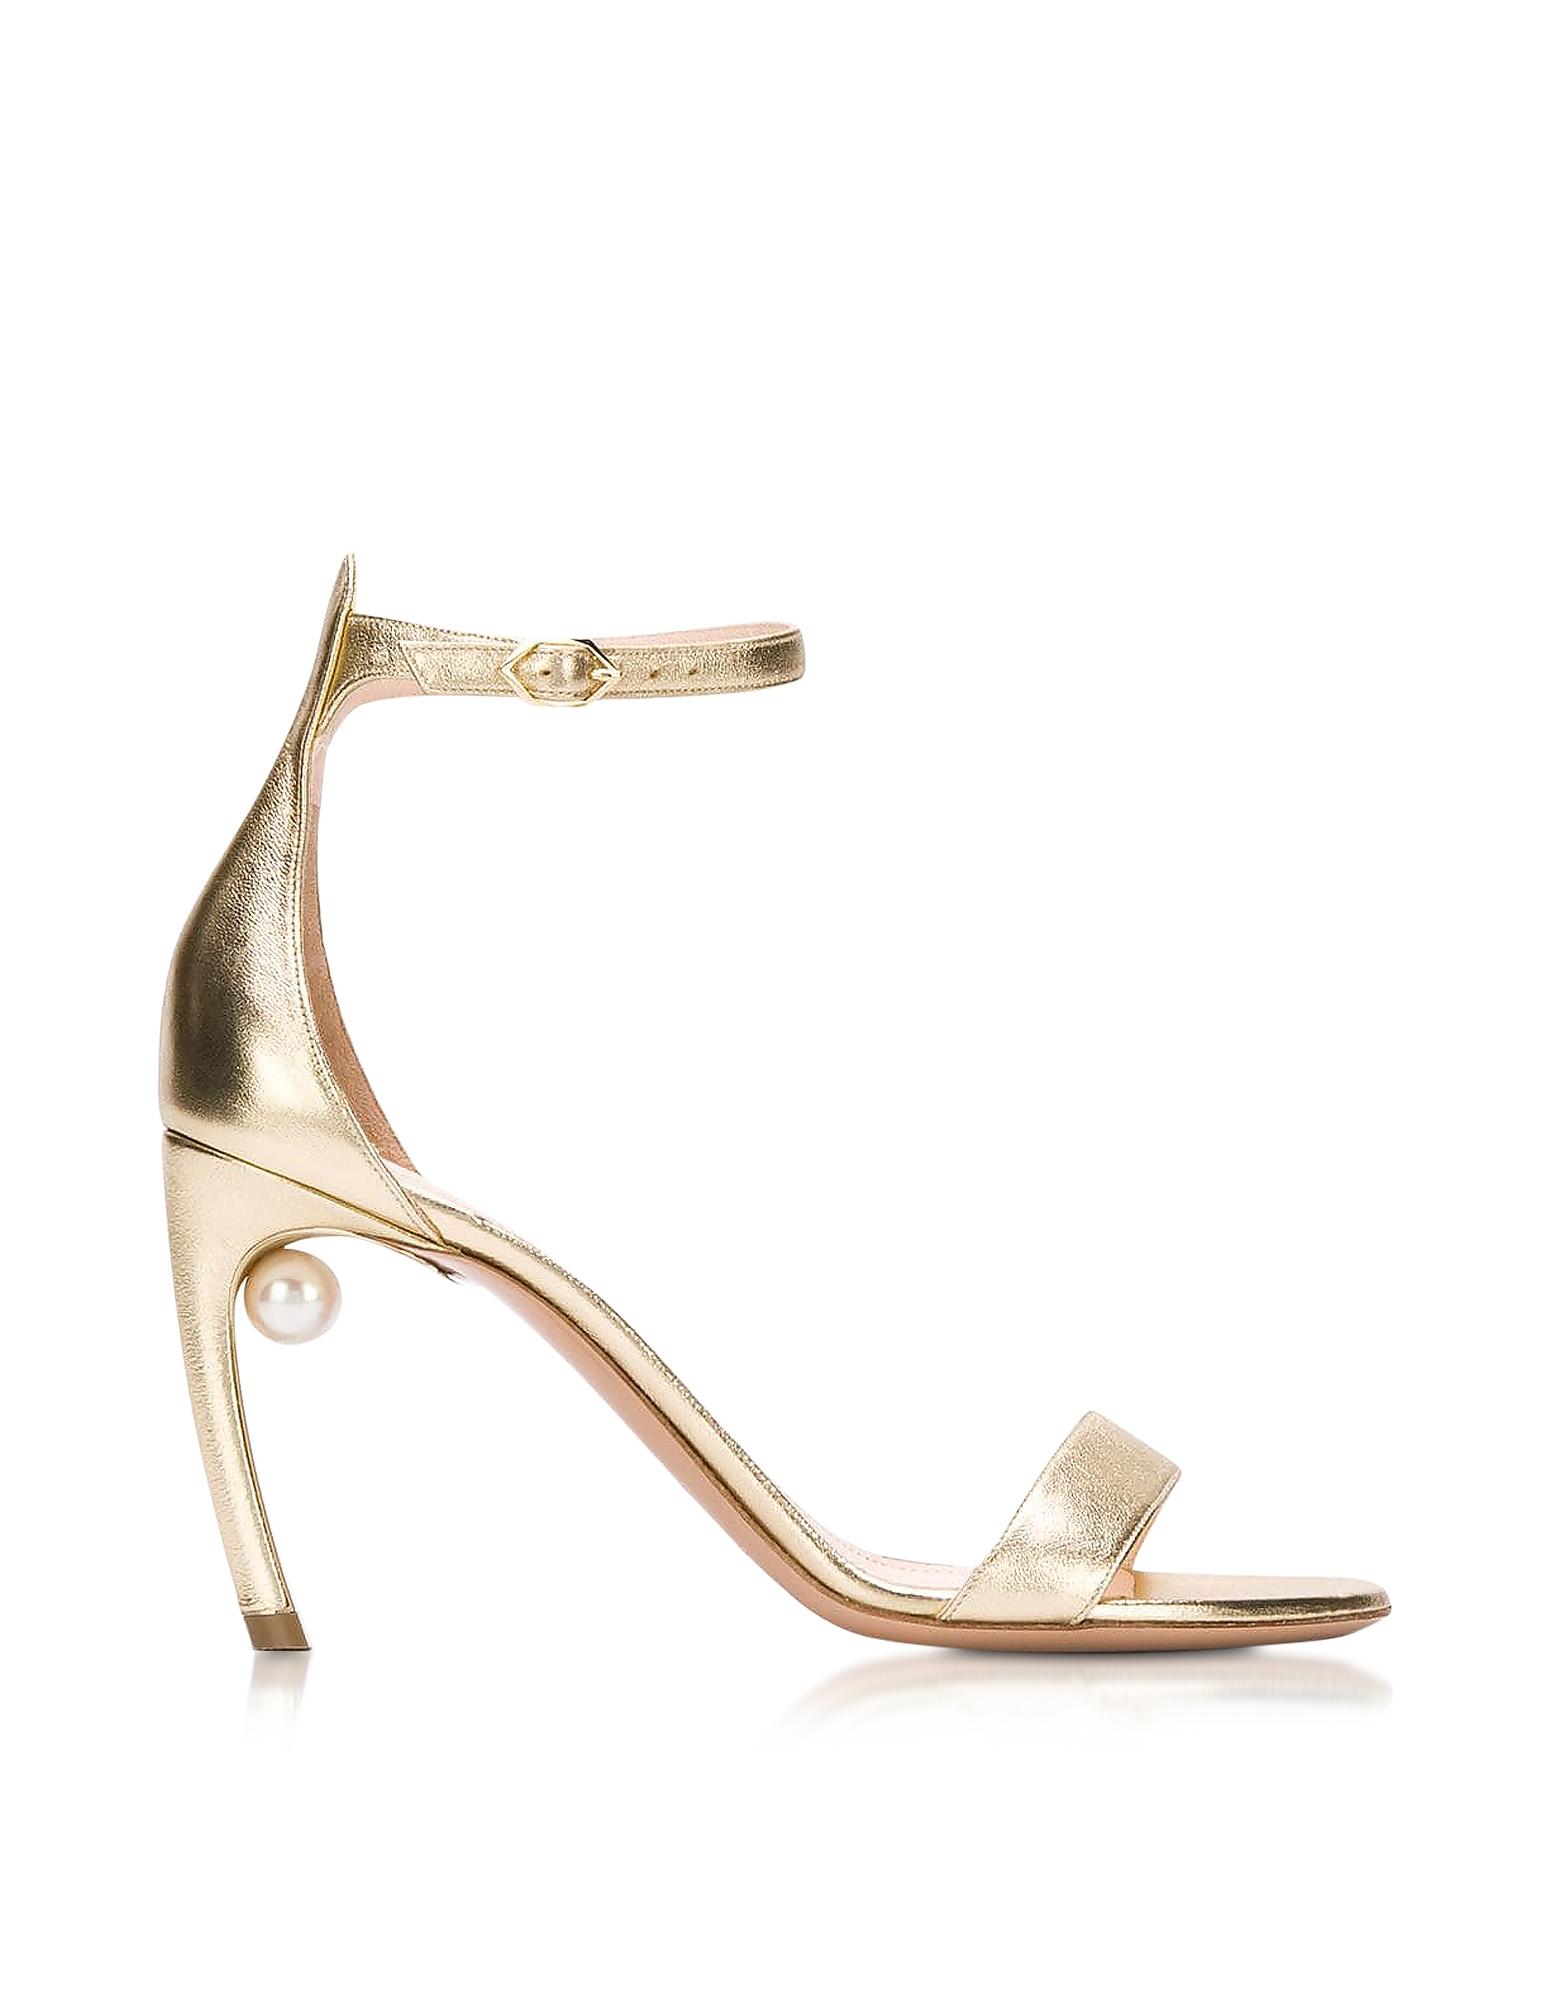 Nicholas Kirkwood Designer Shoes, Metallic Nappa 90mm Mira Pearl Sandals